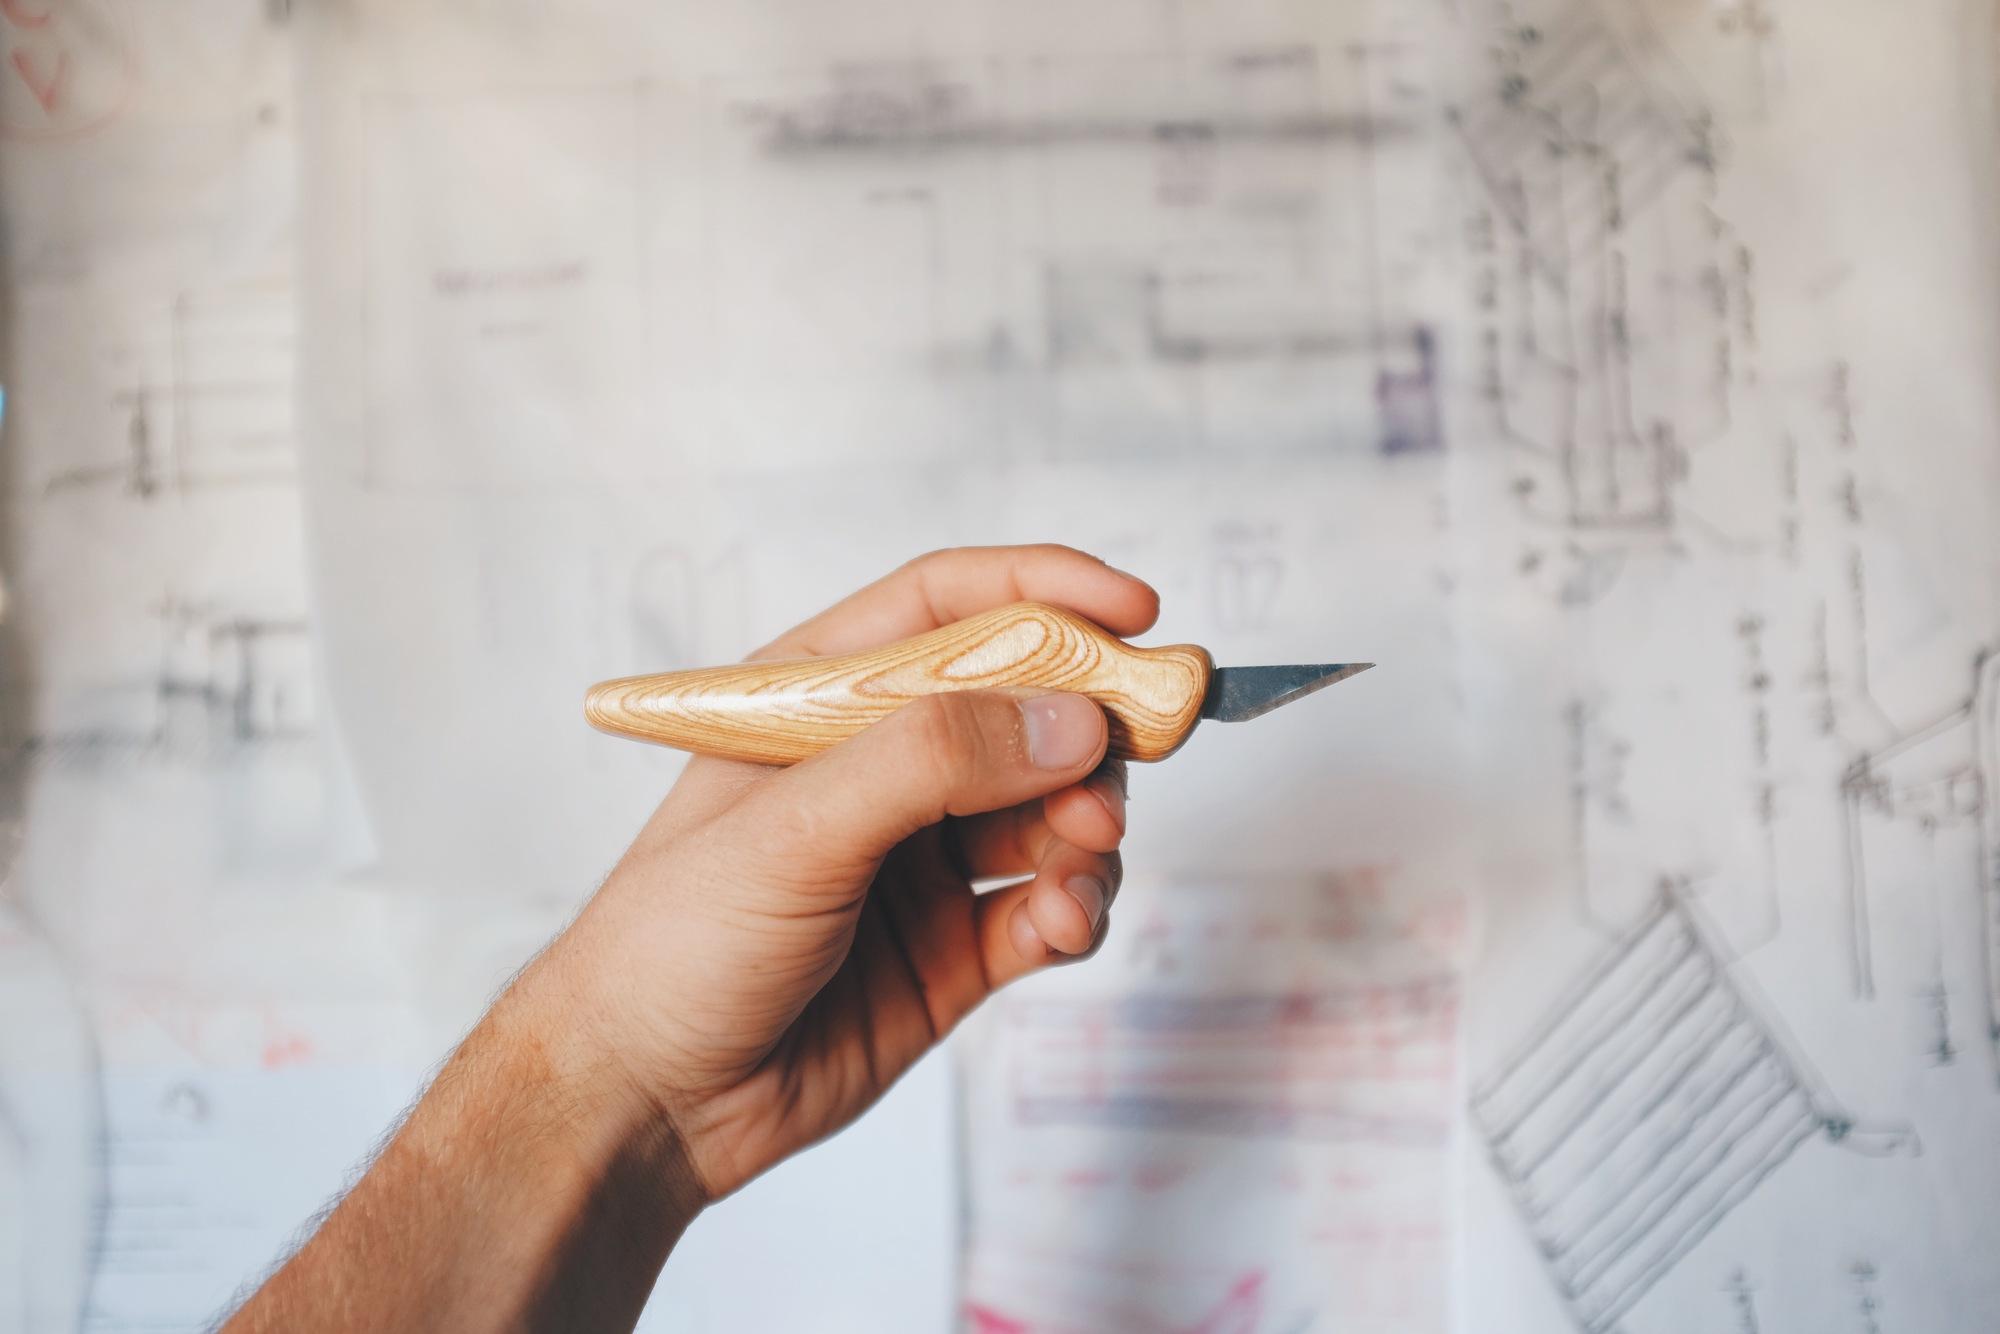 Maquete de arquitetura: estilete ergonômico